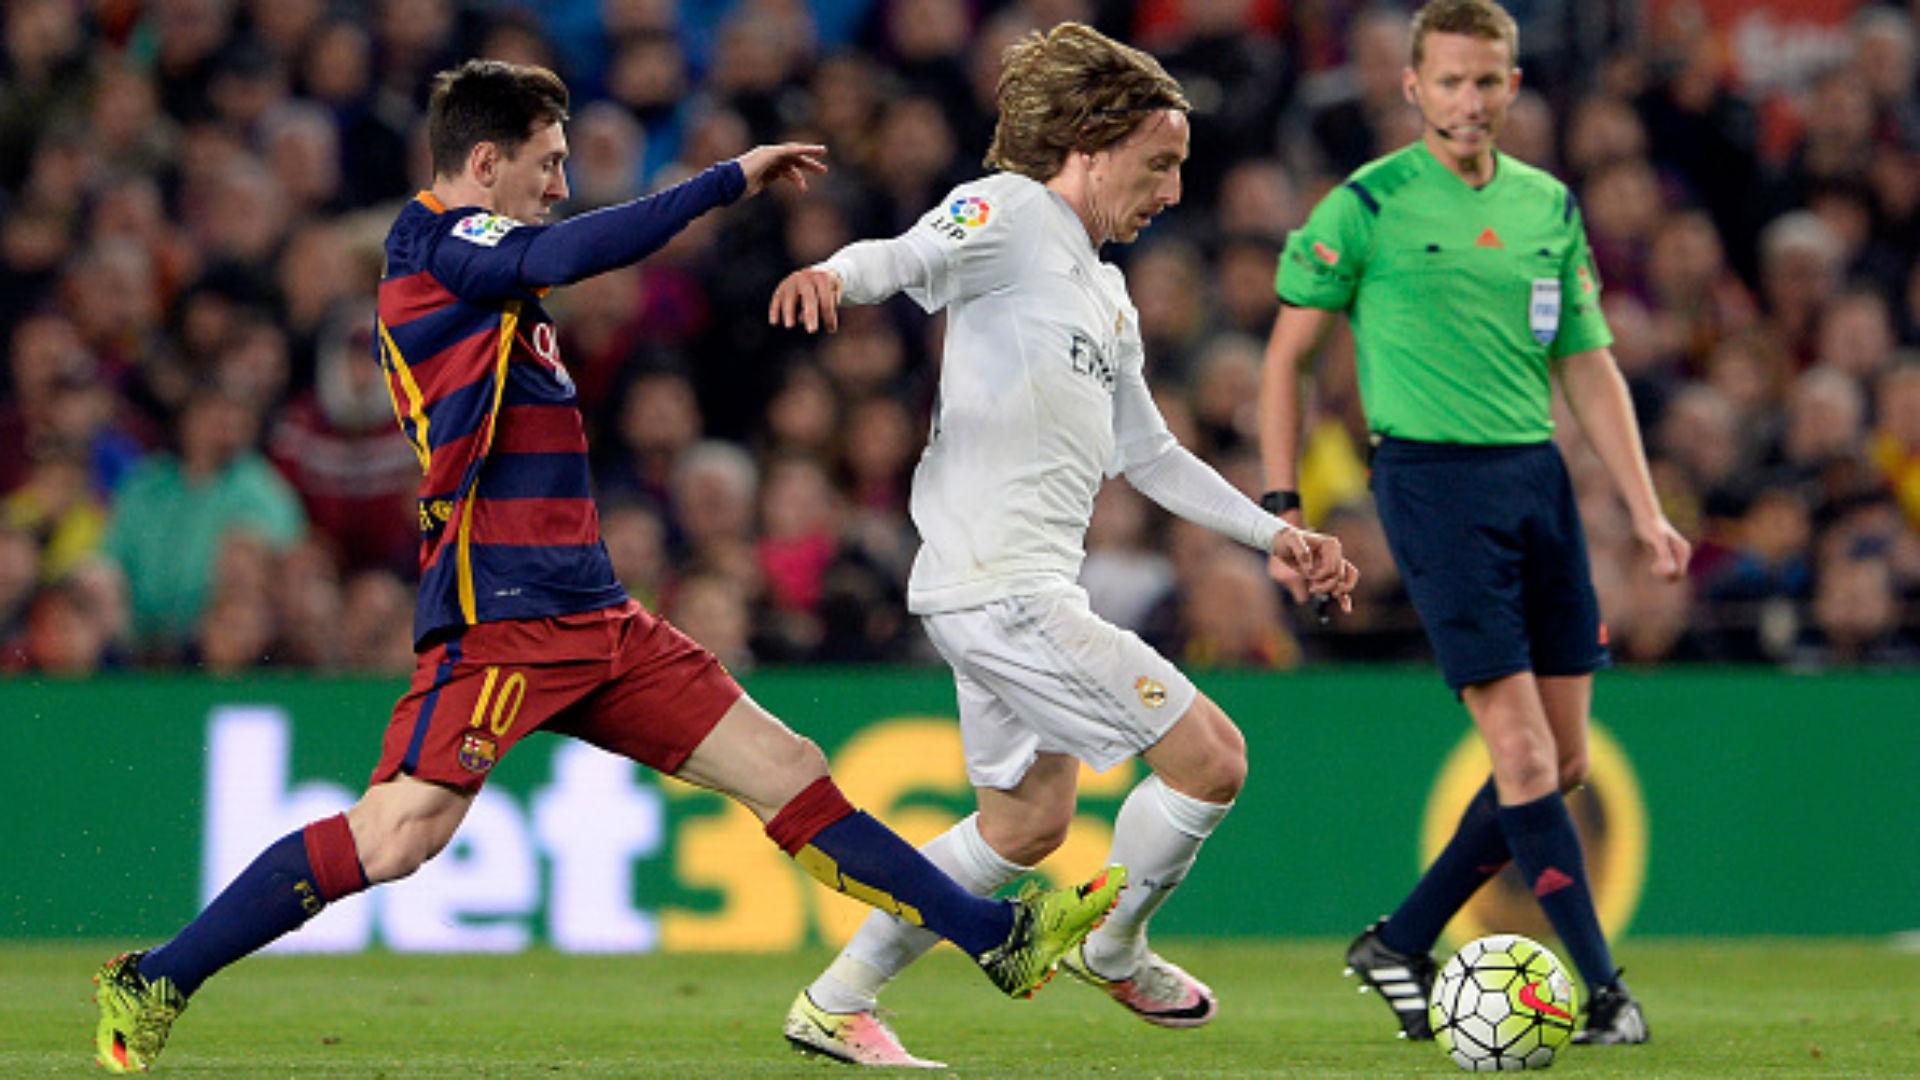 FC Barcelona Real Madrid 2016 15/16 Camp Nou La Liga